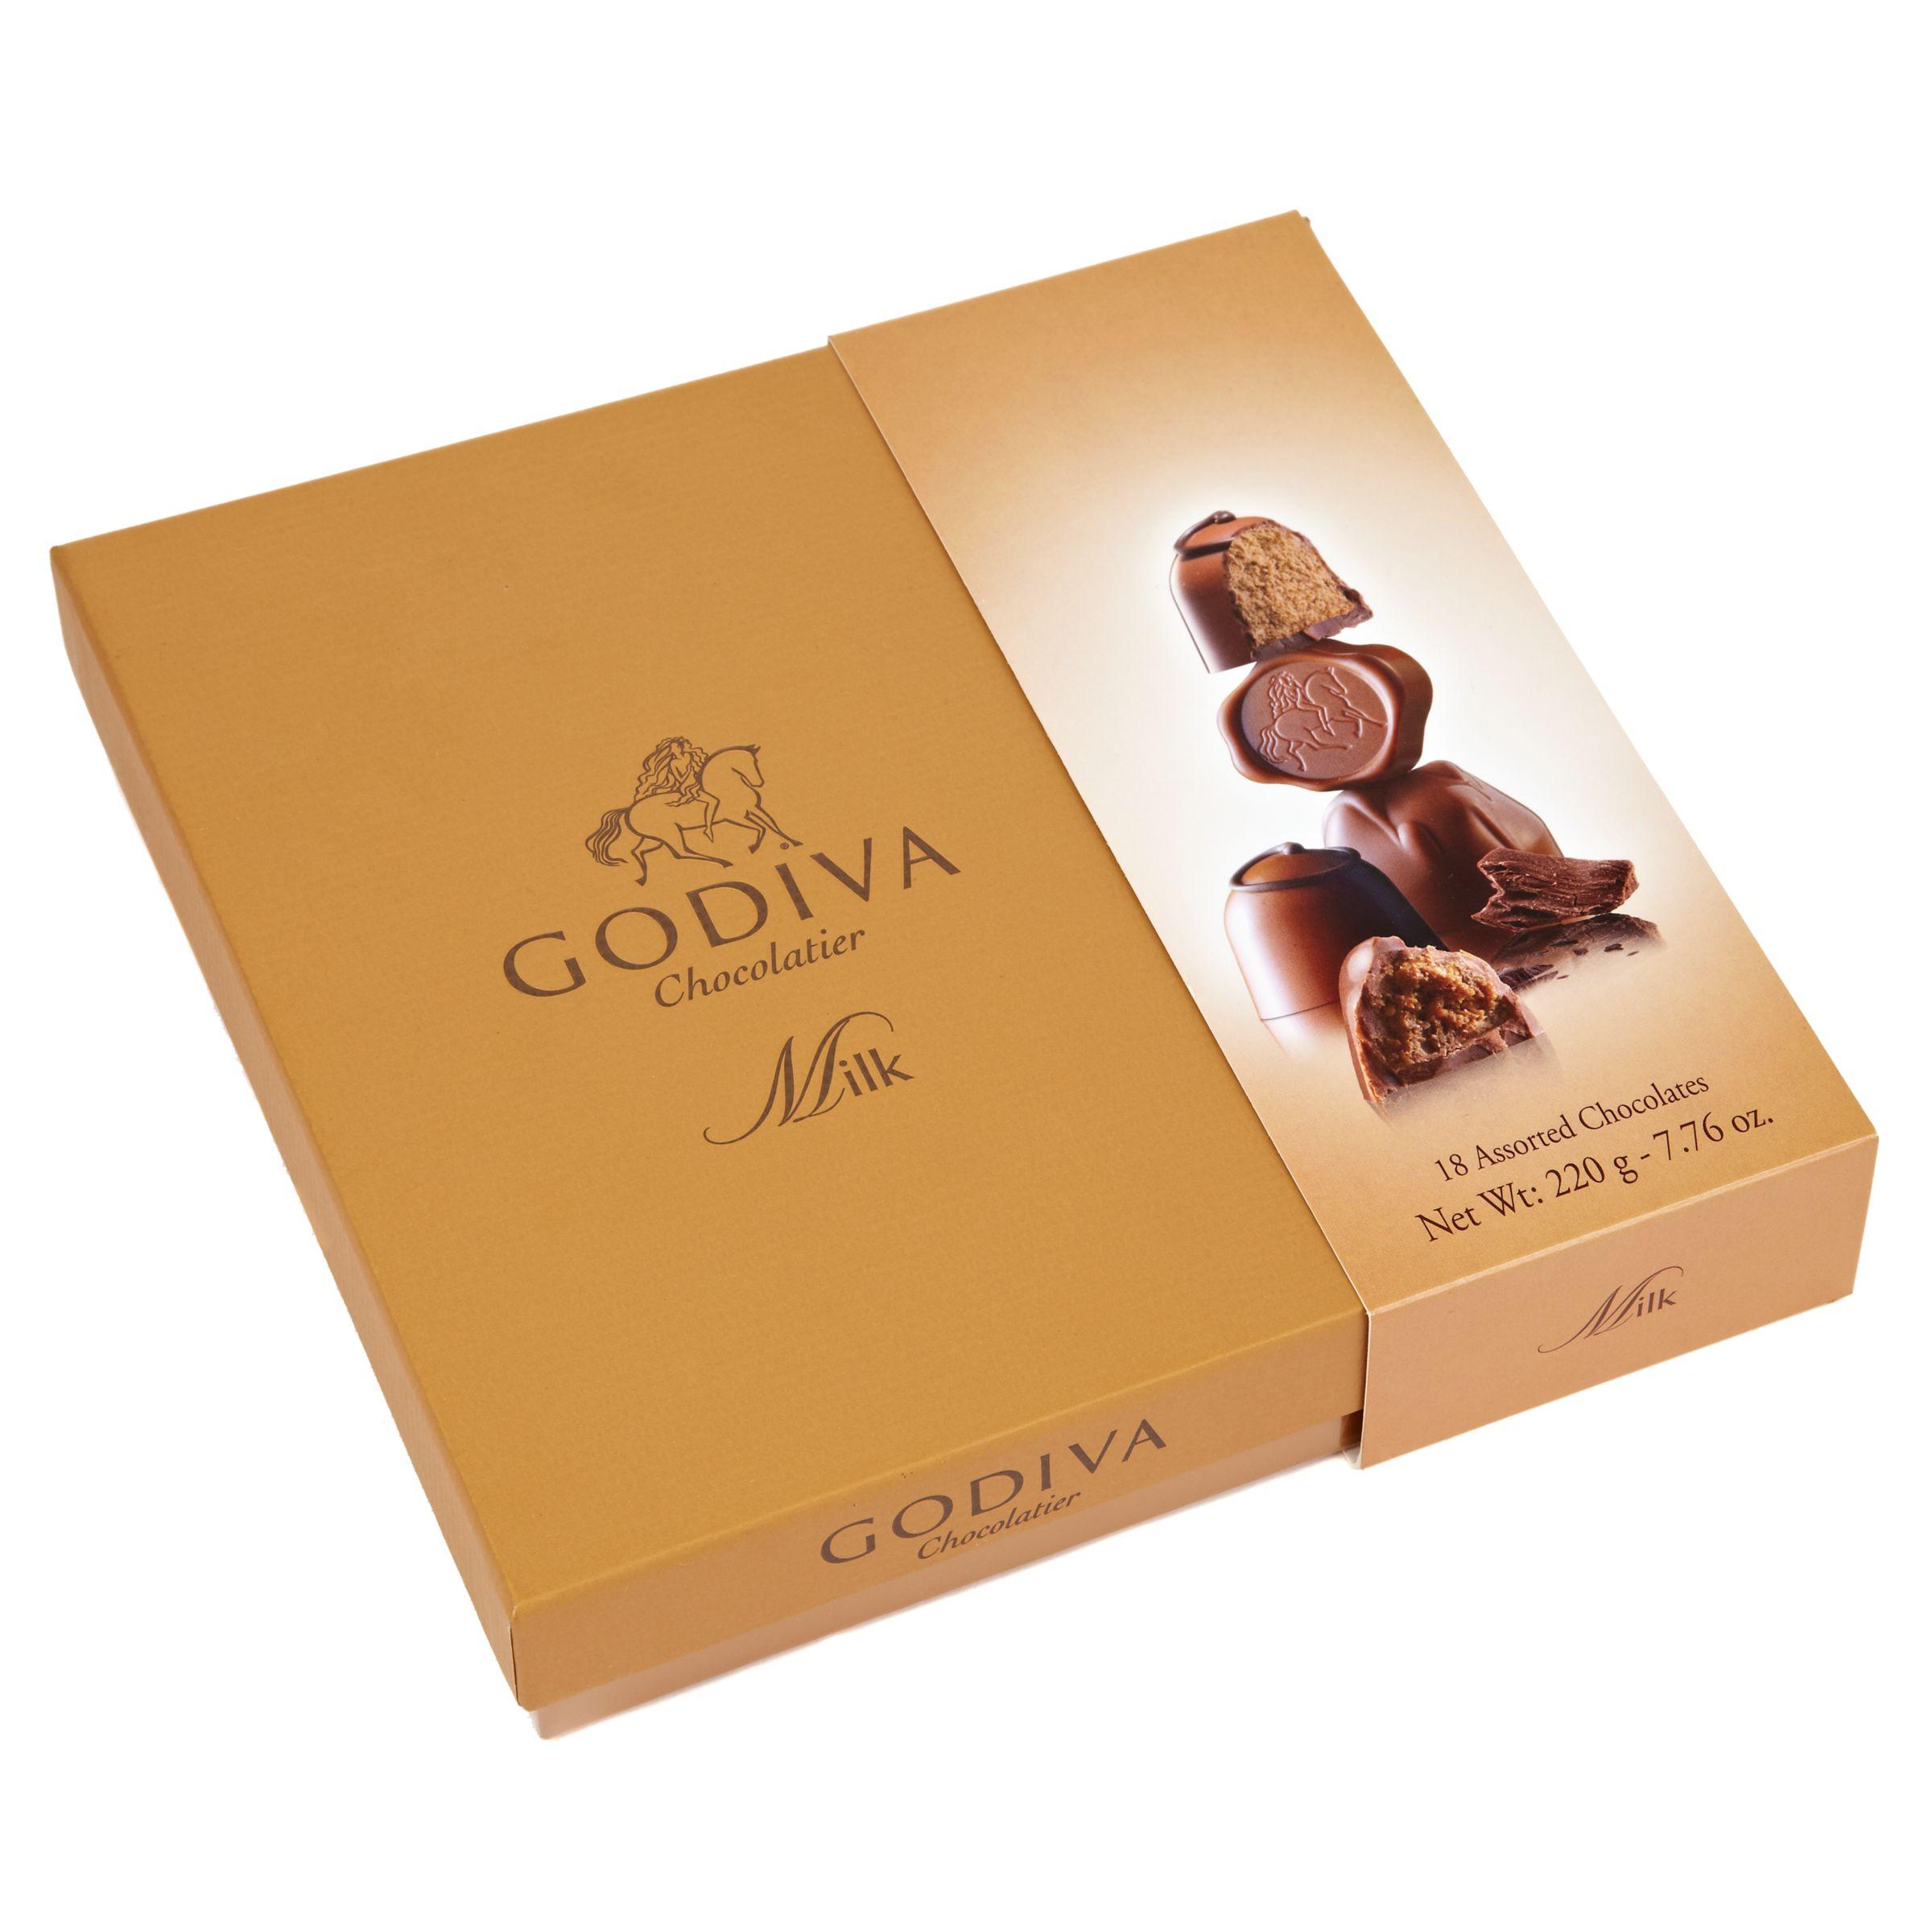 Godiva Godiva Connoisseur Milk Chocolate Selection, 220g